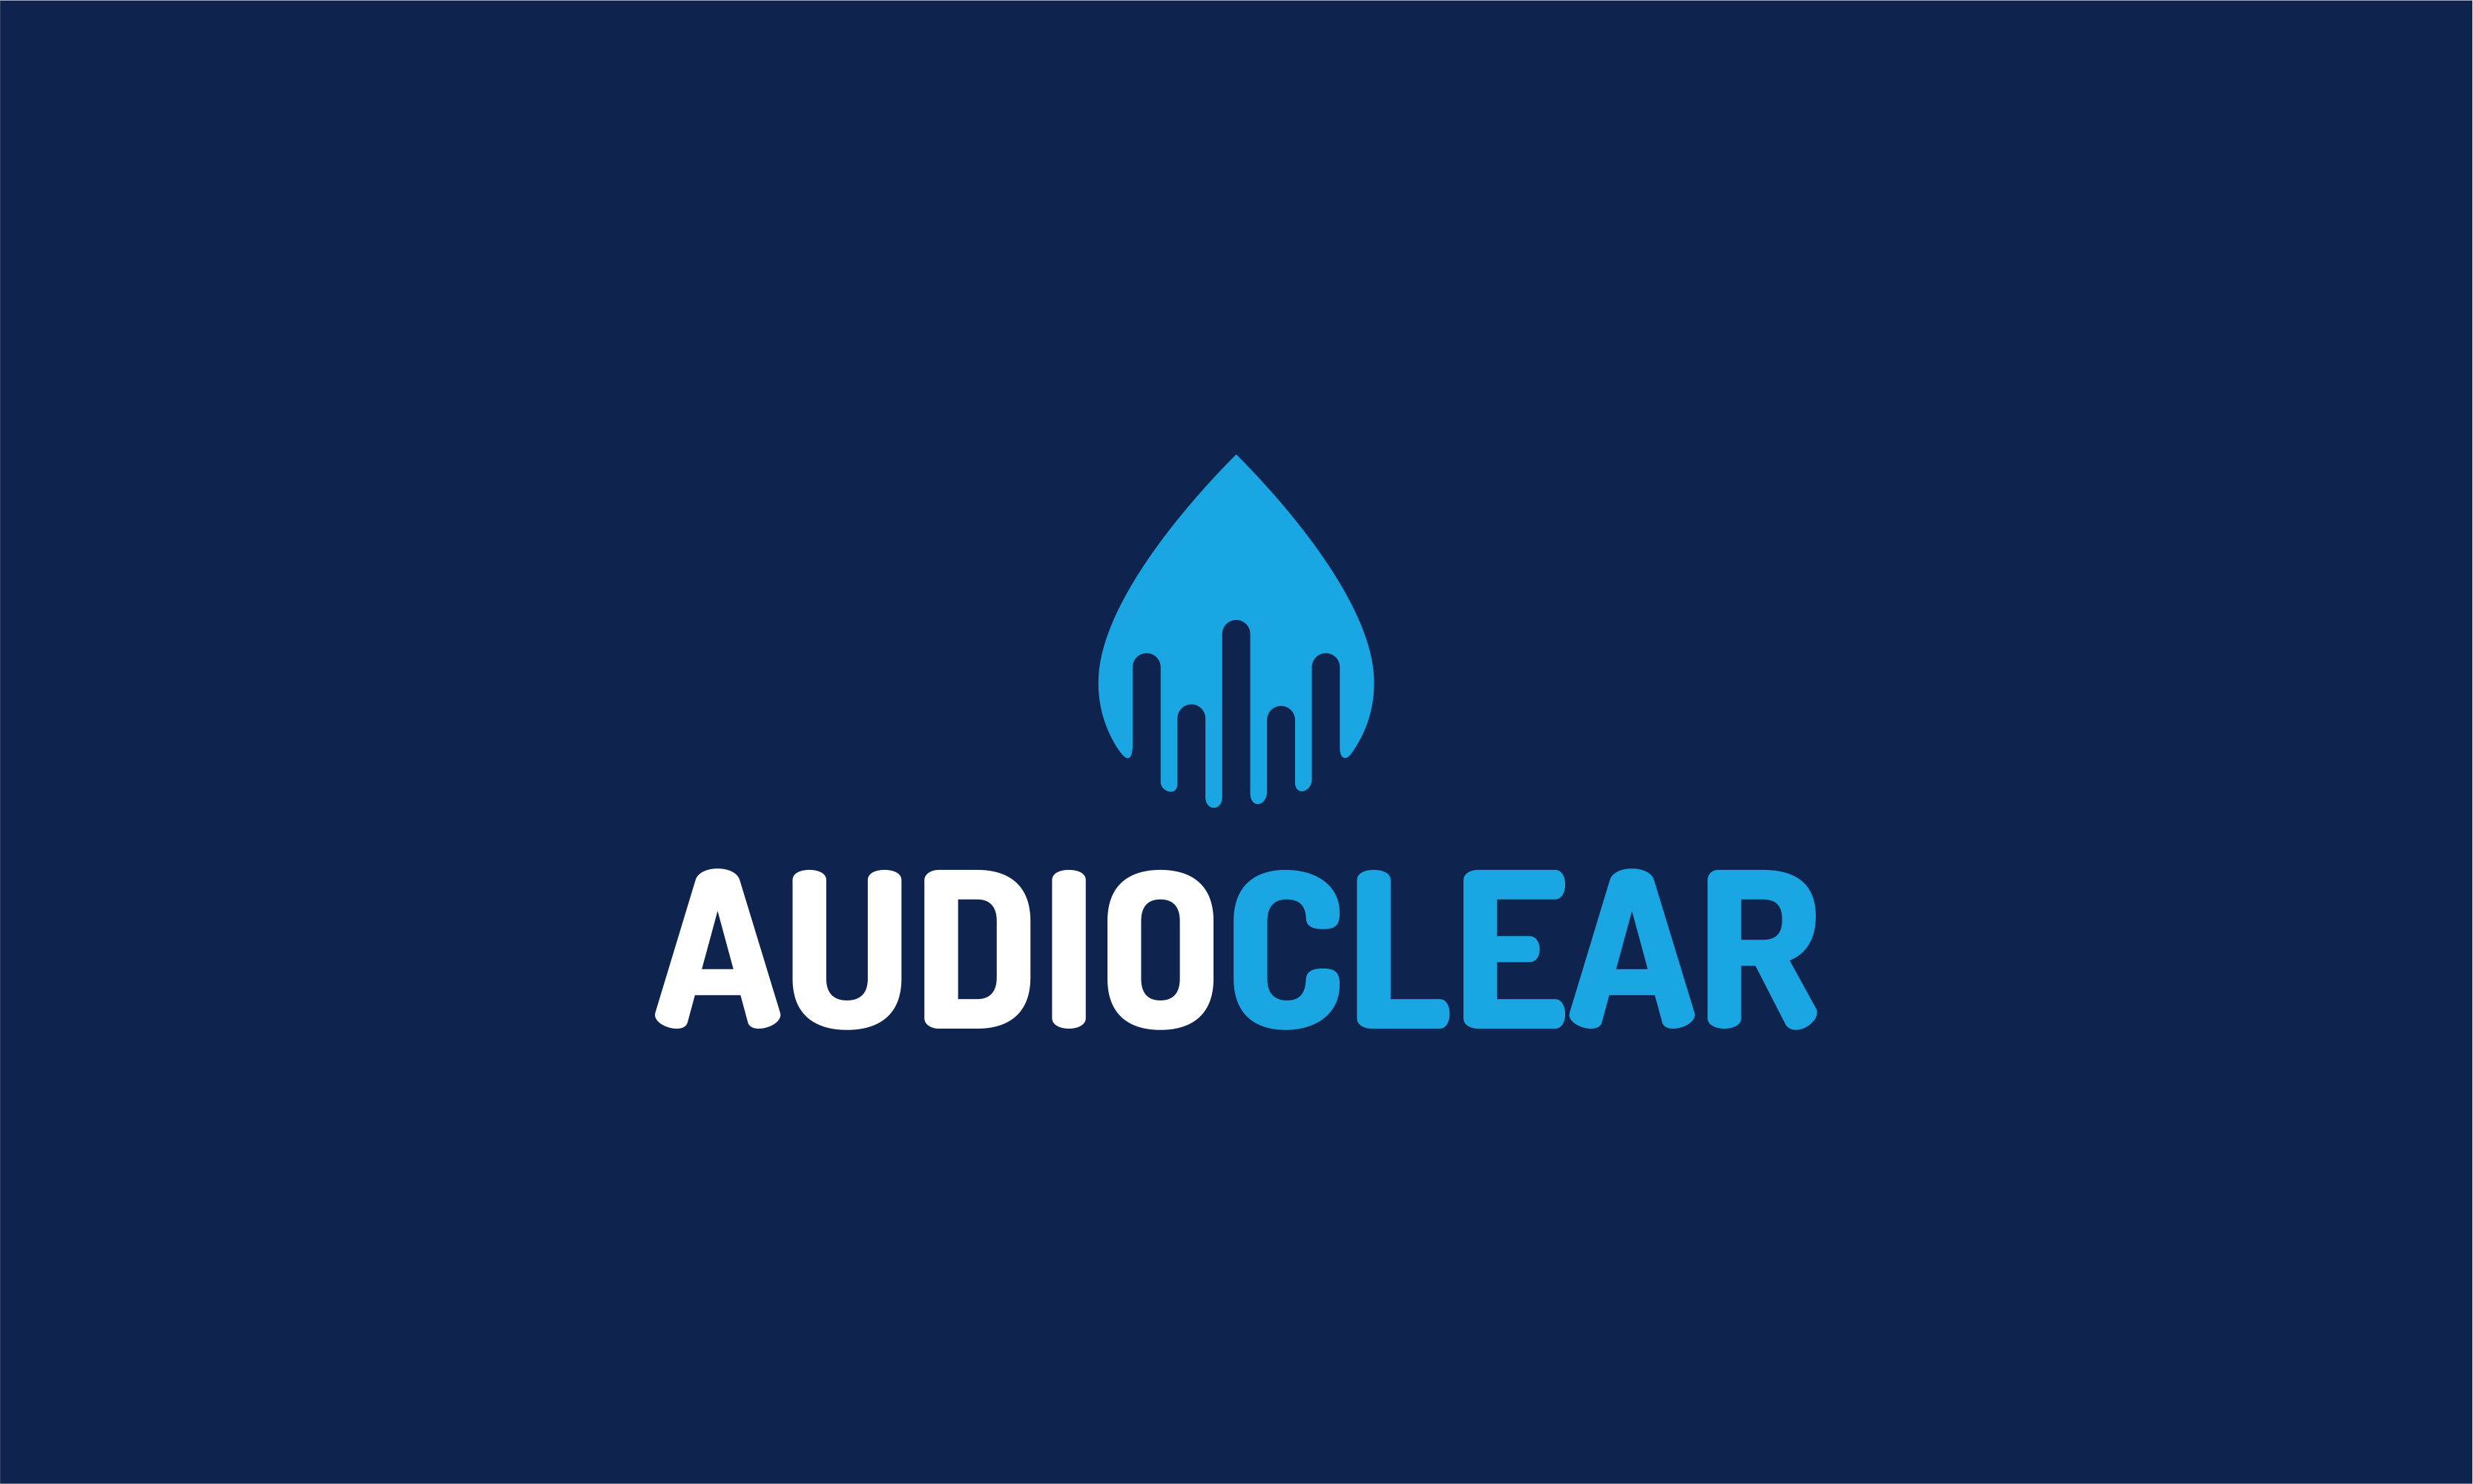 Audioclear